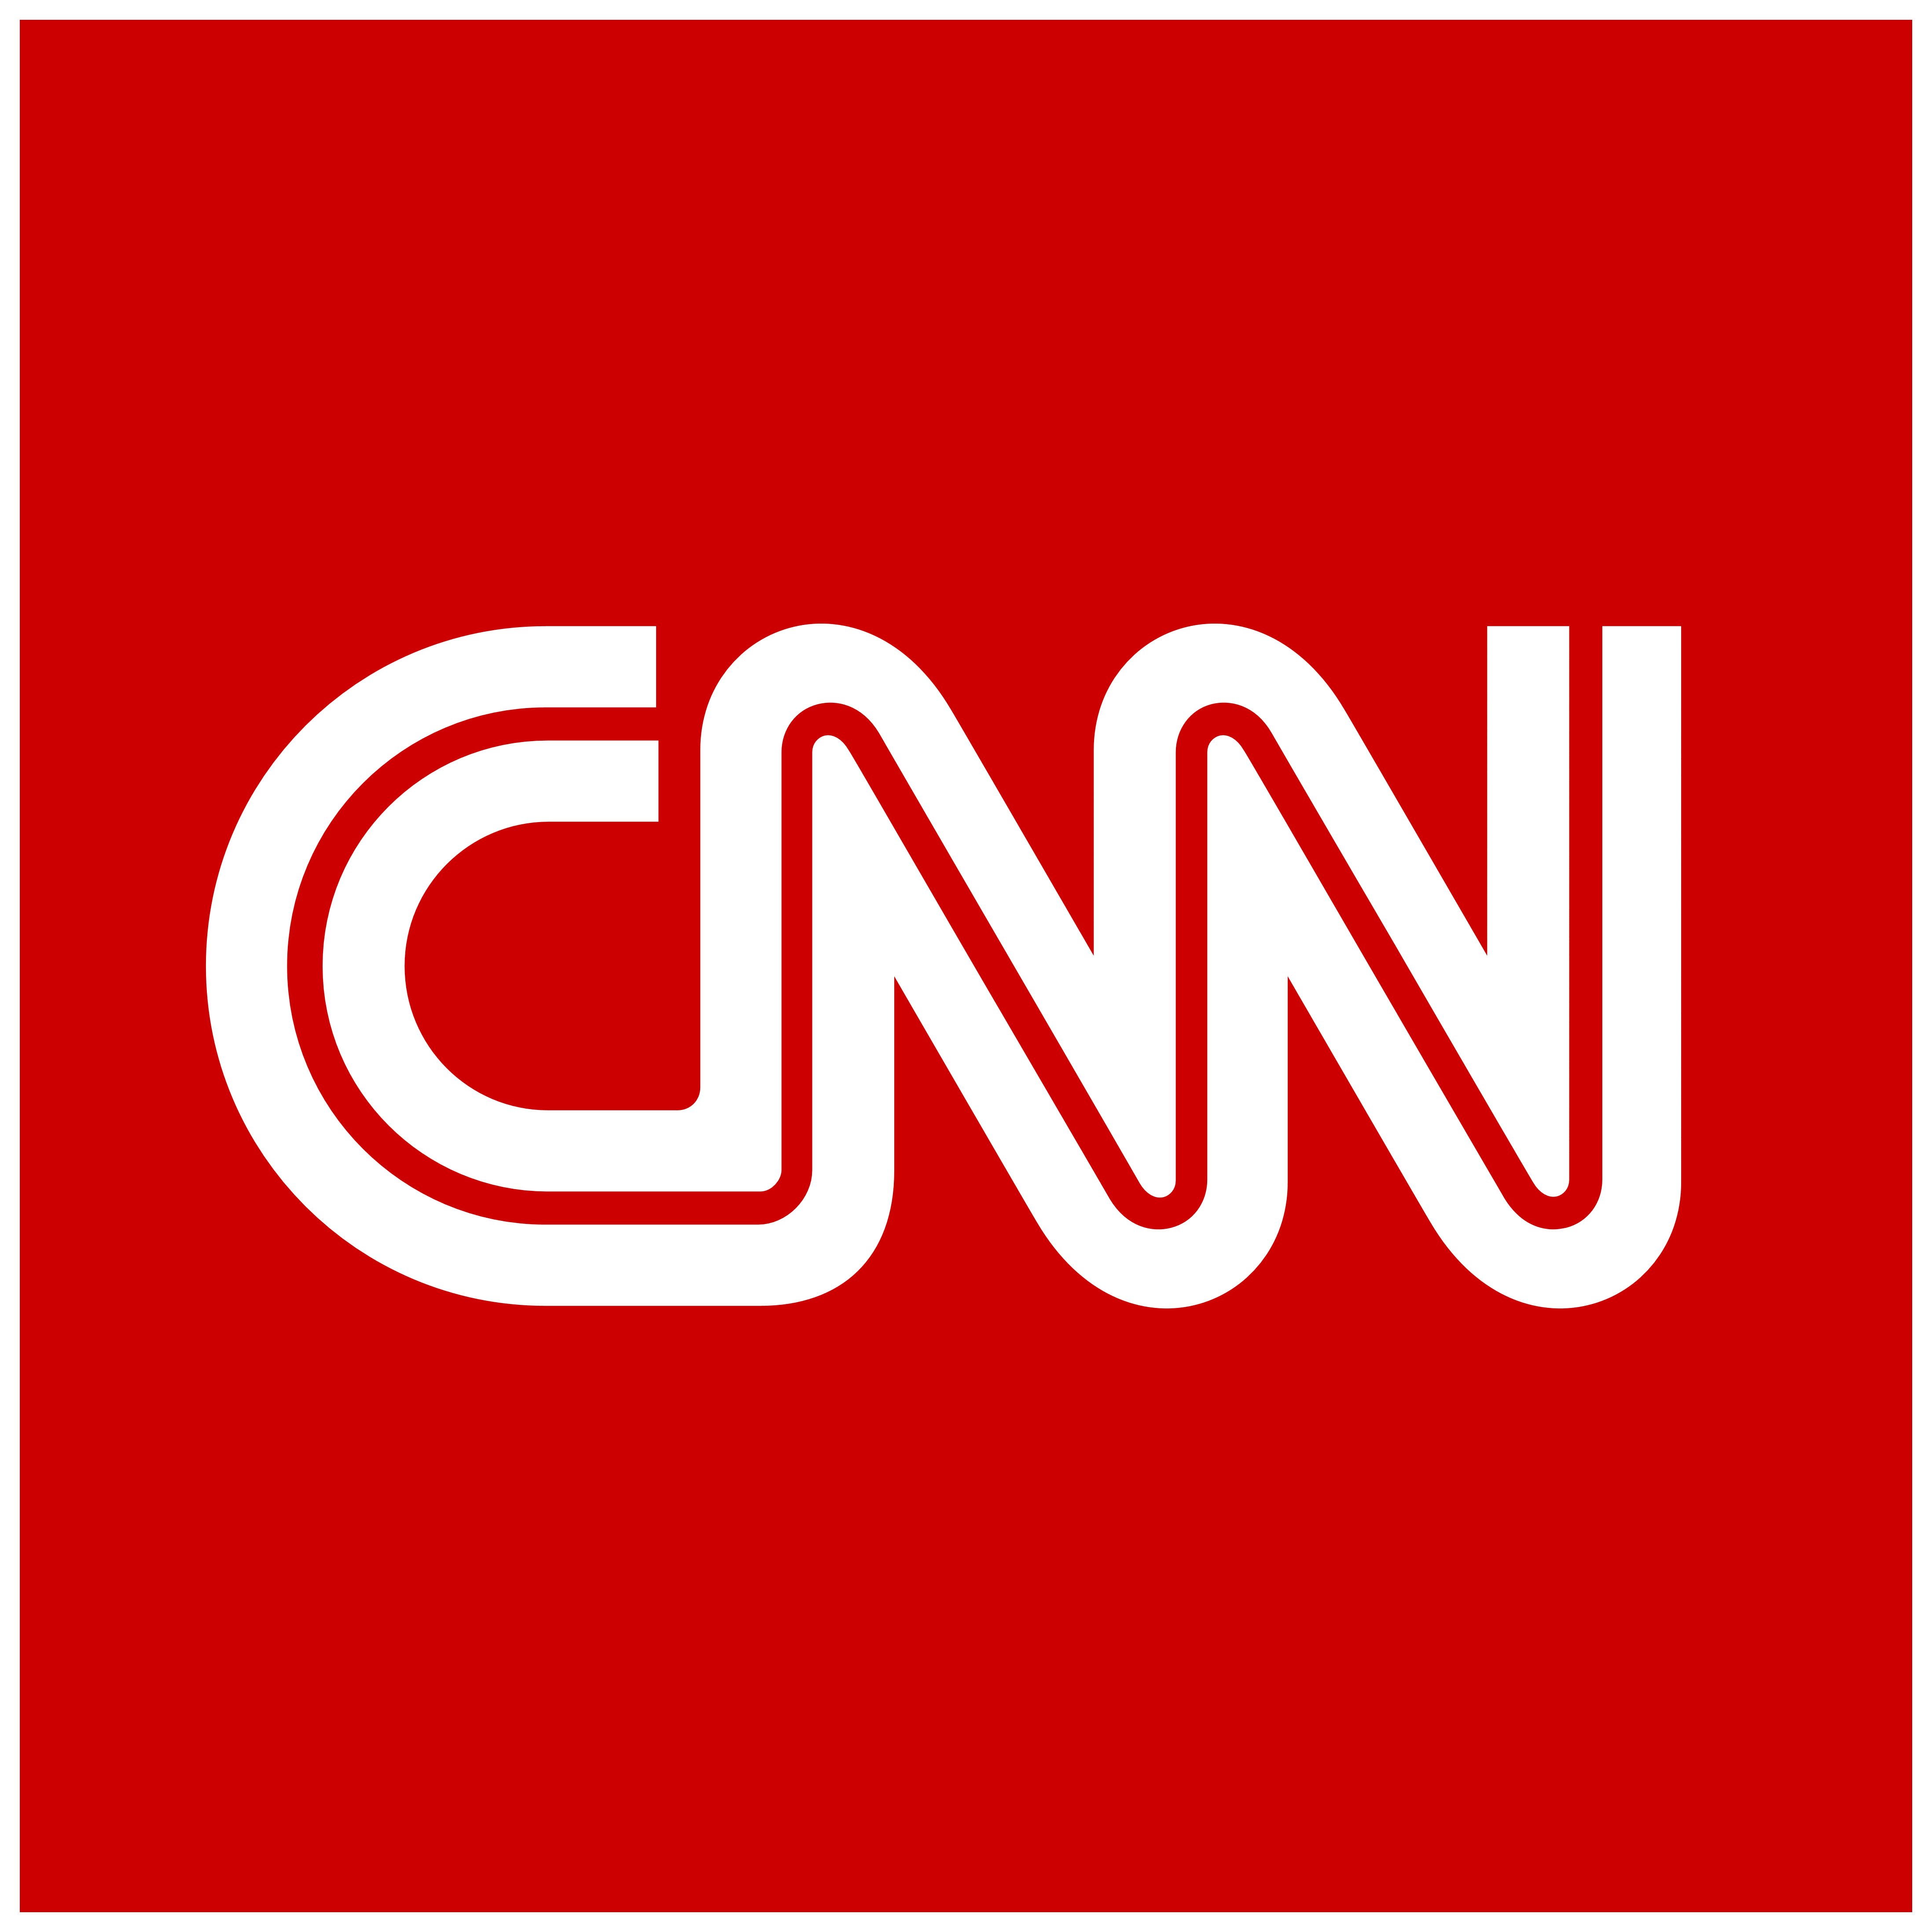 Cnn – Logos, Brands And Logotypes - Cnn Logo PNG